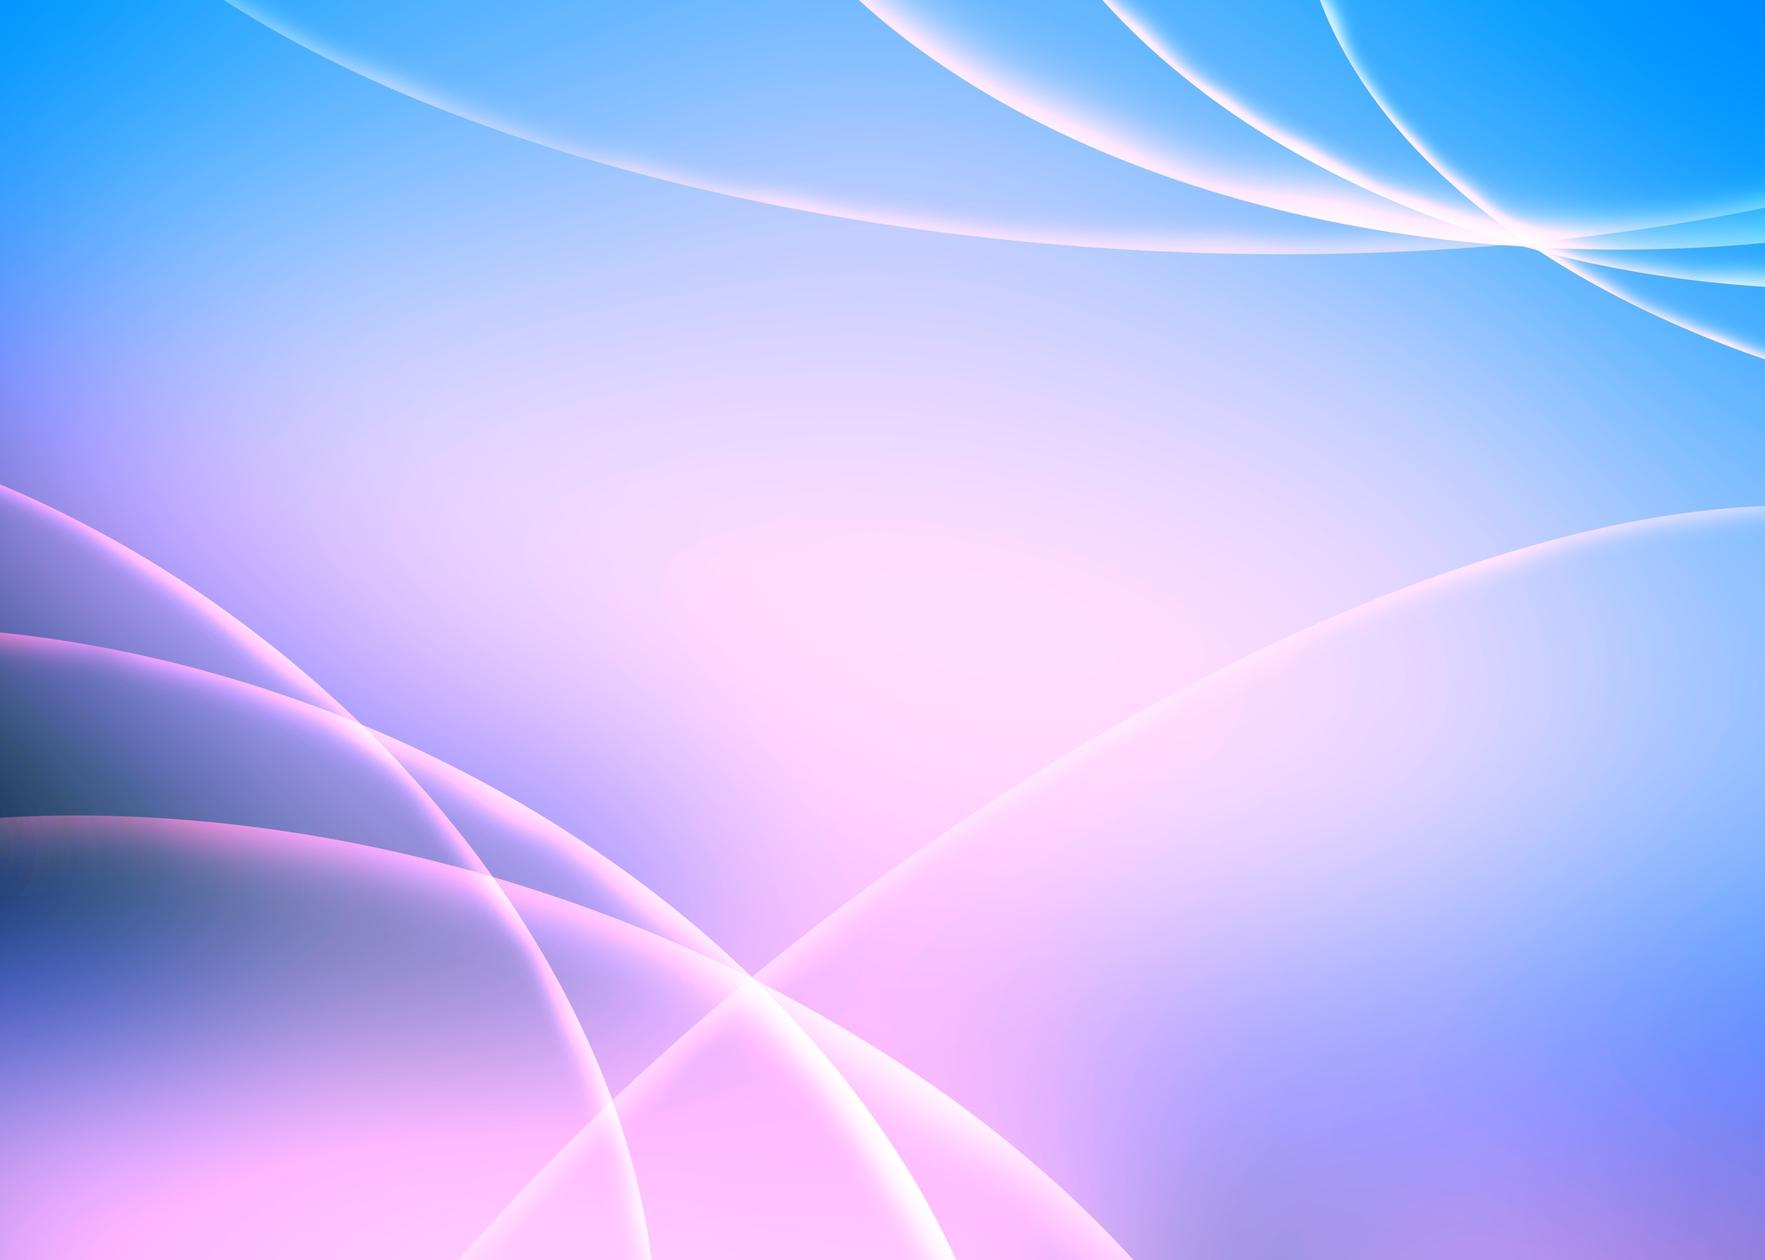 Nice Background Picture - WallpaperSafari